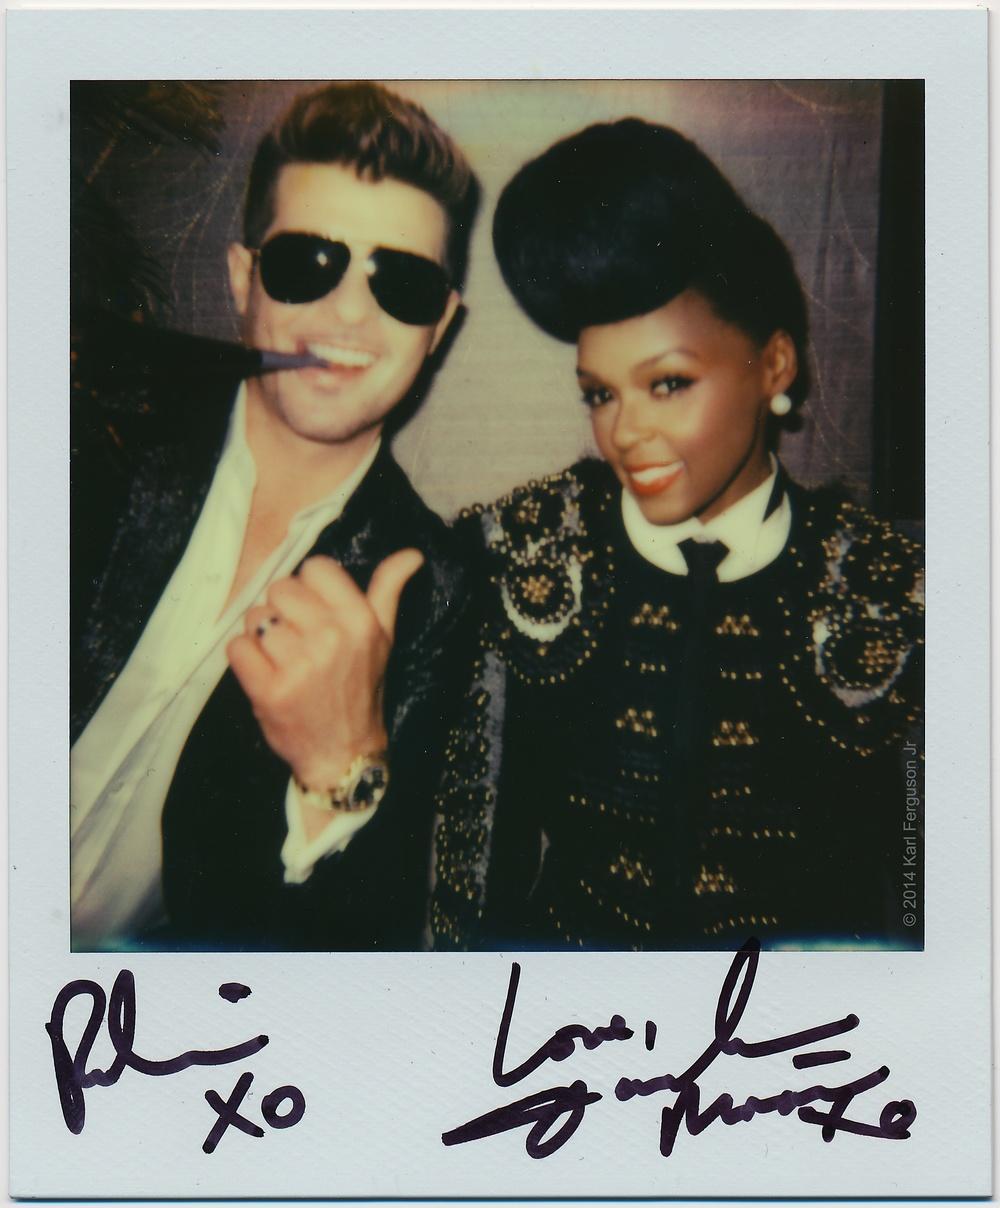 Robin_and_Janelle_Polaroid1_SBS_mini.jpg